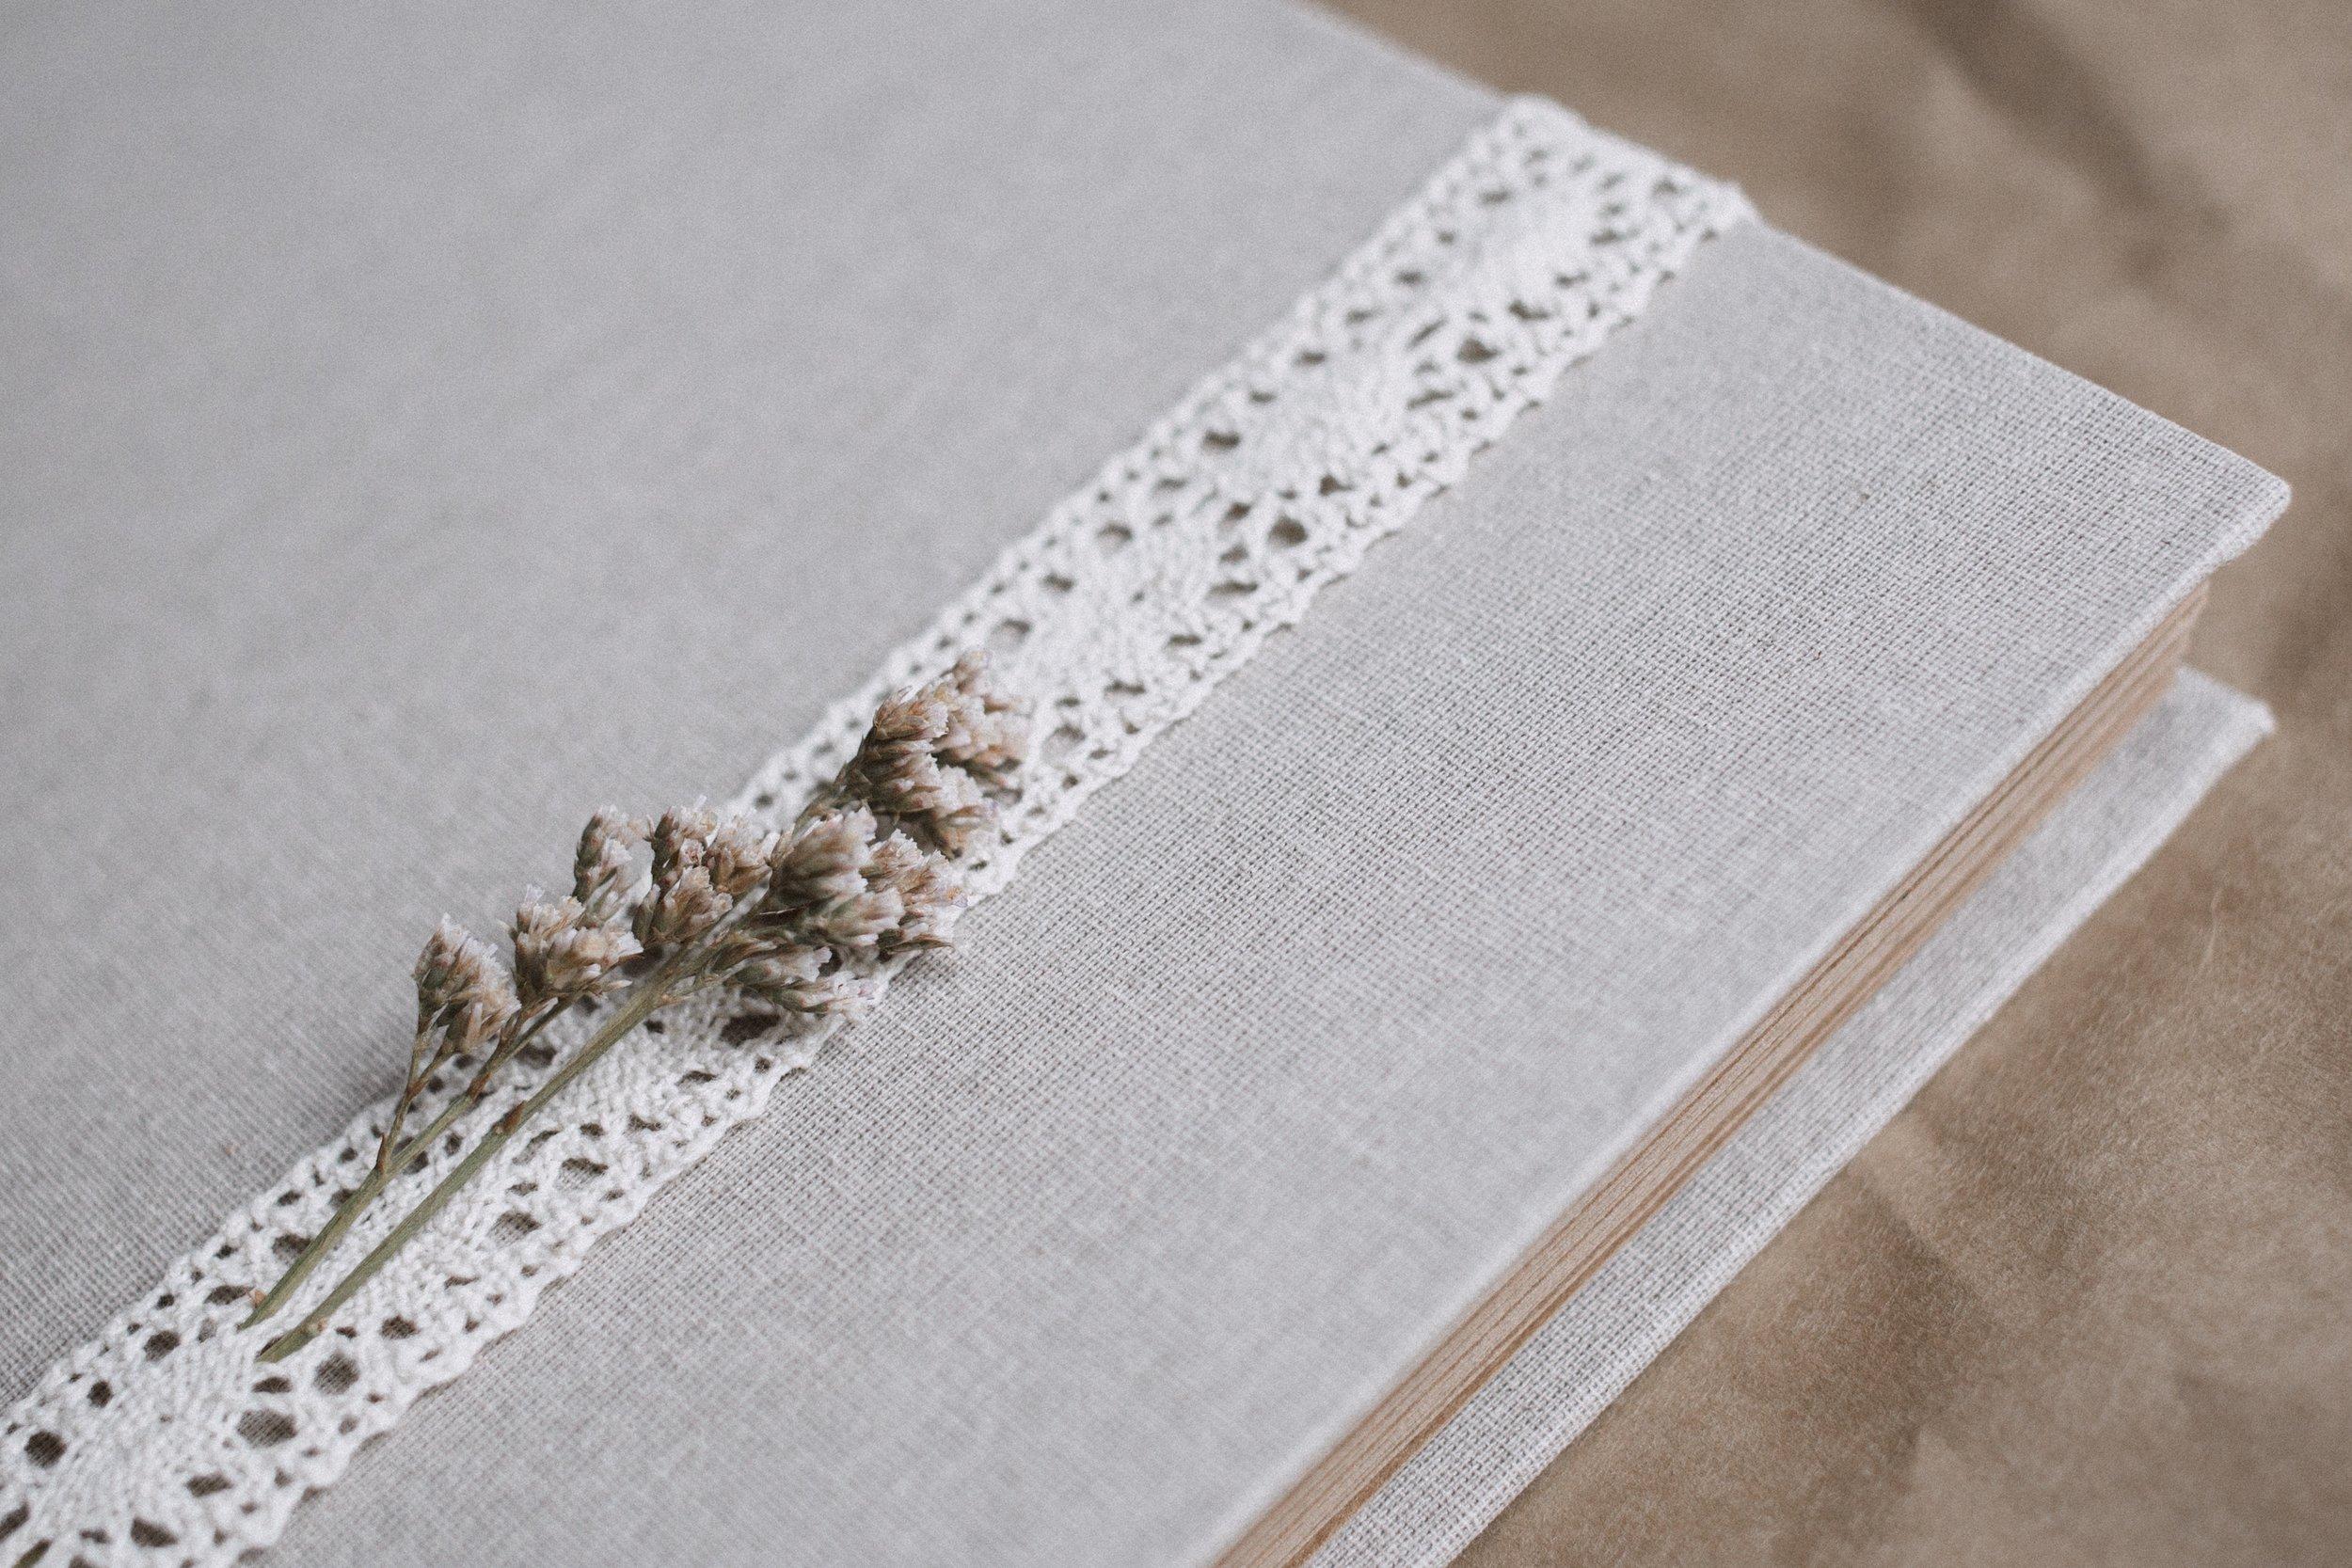 bookbinding image.jpg